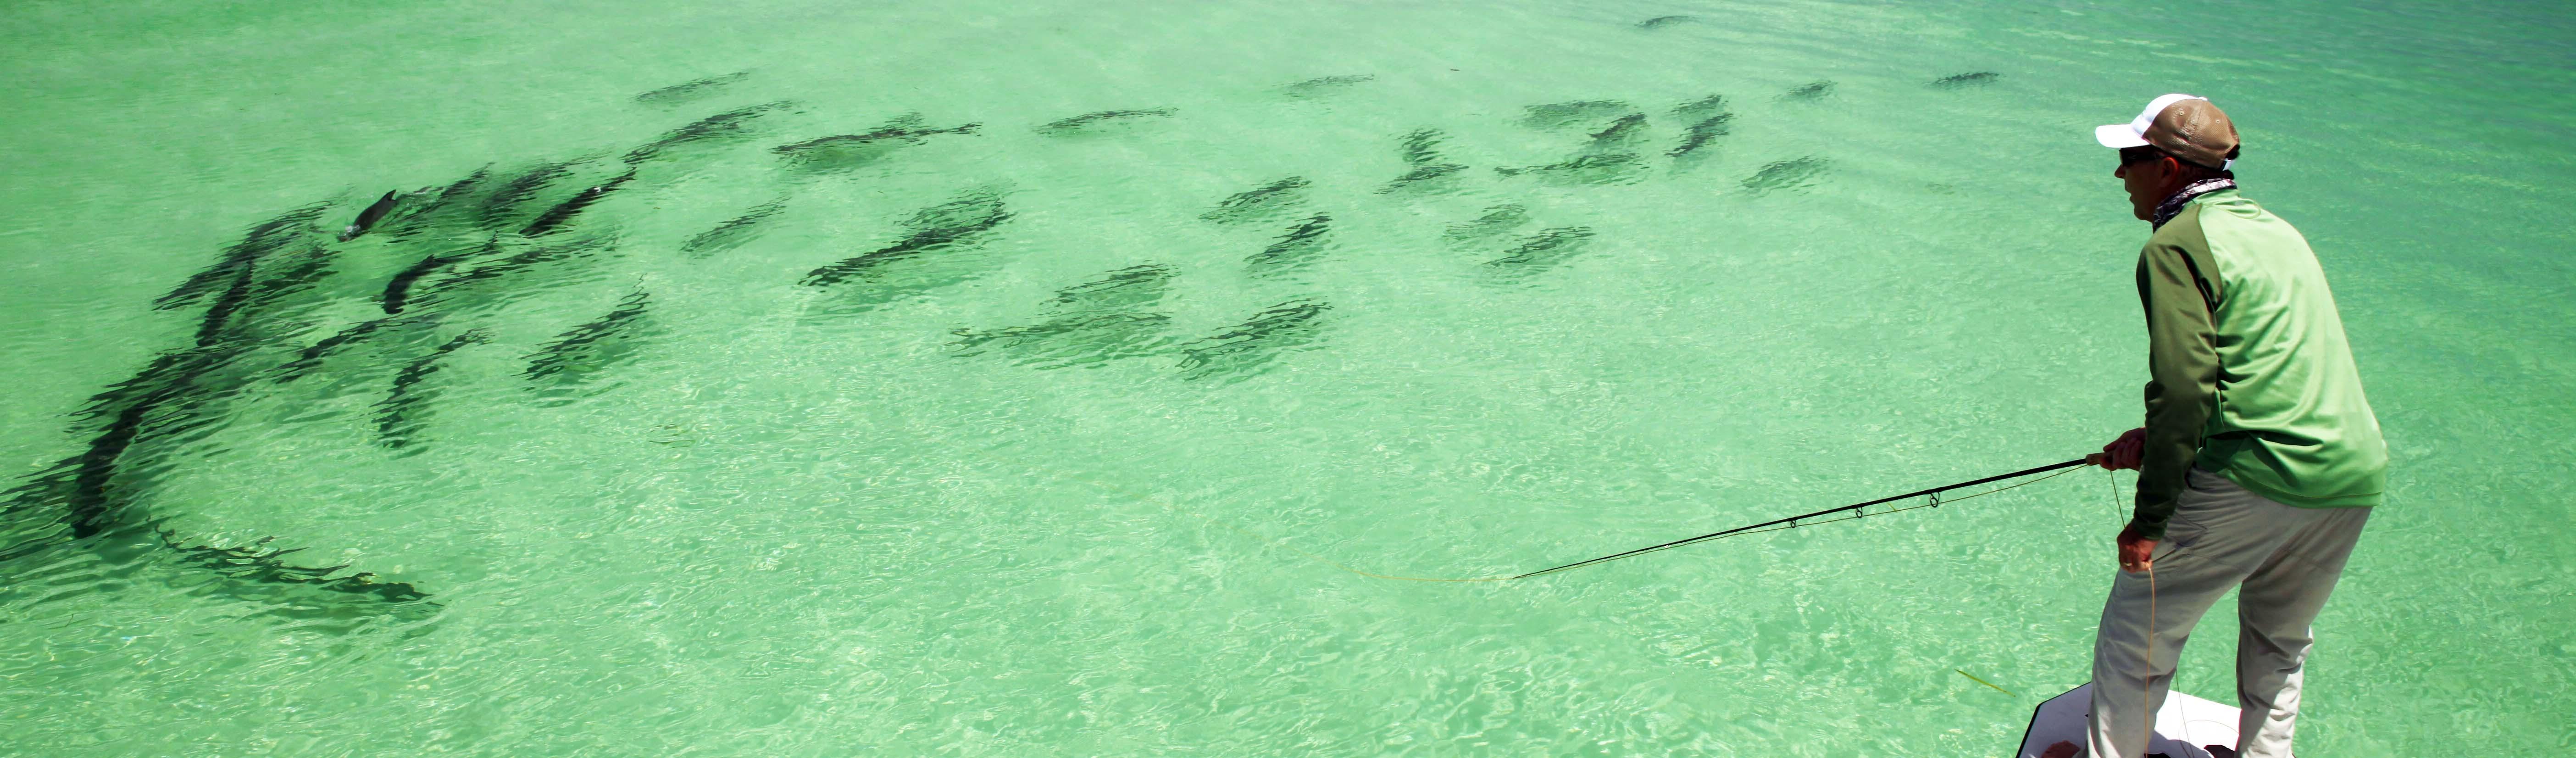 amazing string of migratory tarpon off Key West